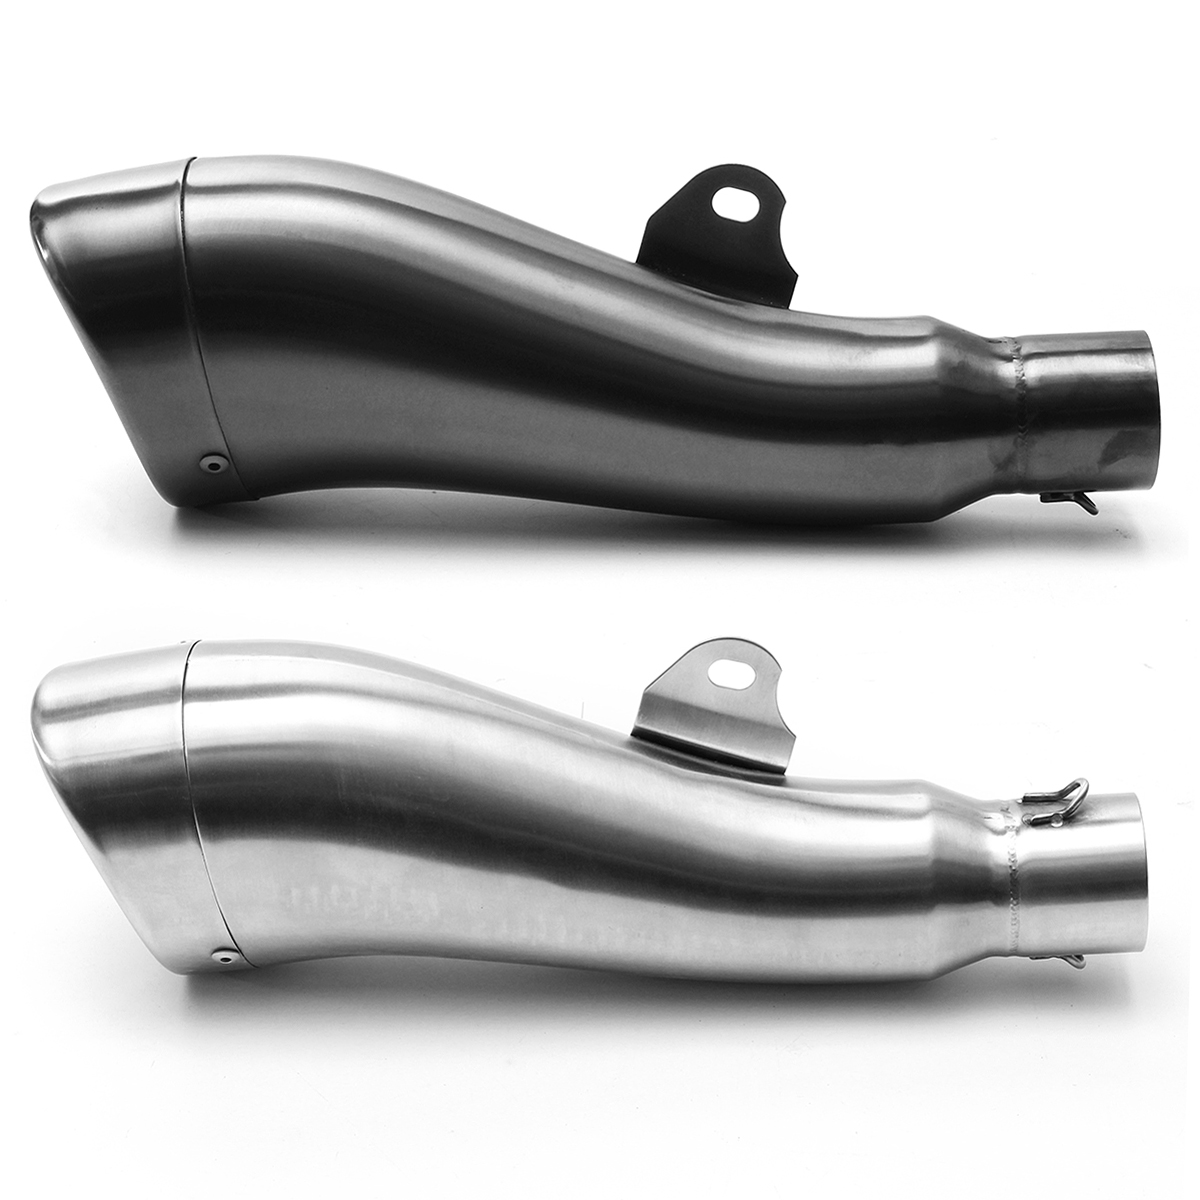 36-51mm Dolphin Shape Motorcycle Motorbike ATV Stainelss Steel GP Exhaust Muffler Pipe Slip-On Trumpet Type Universal For Honda